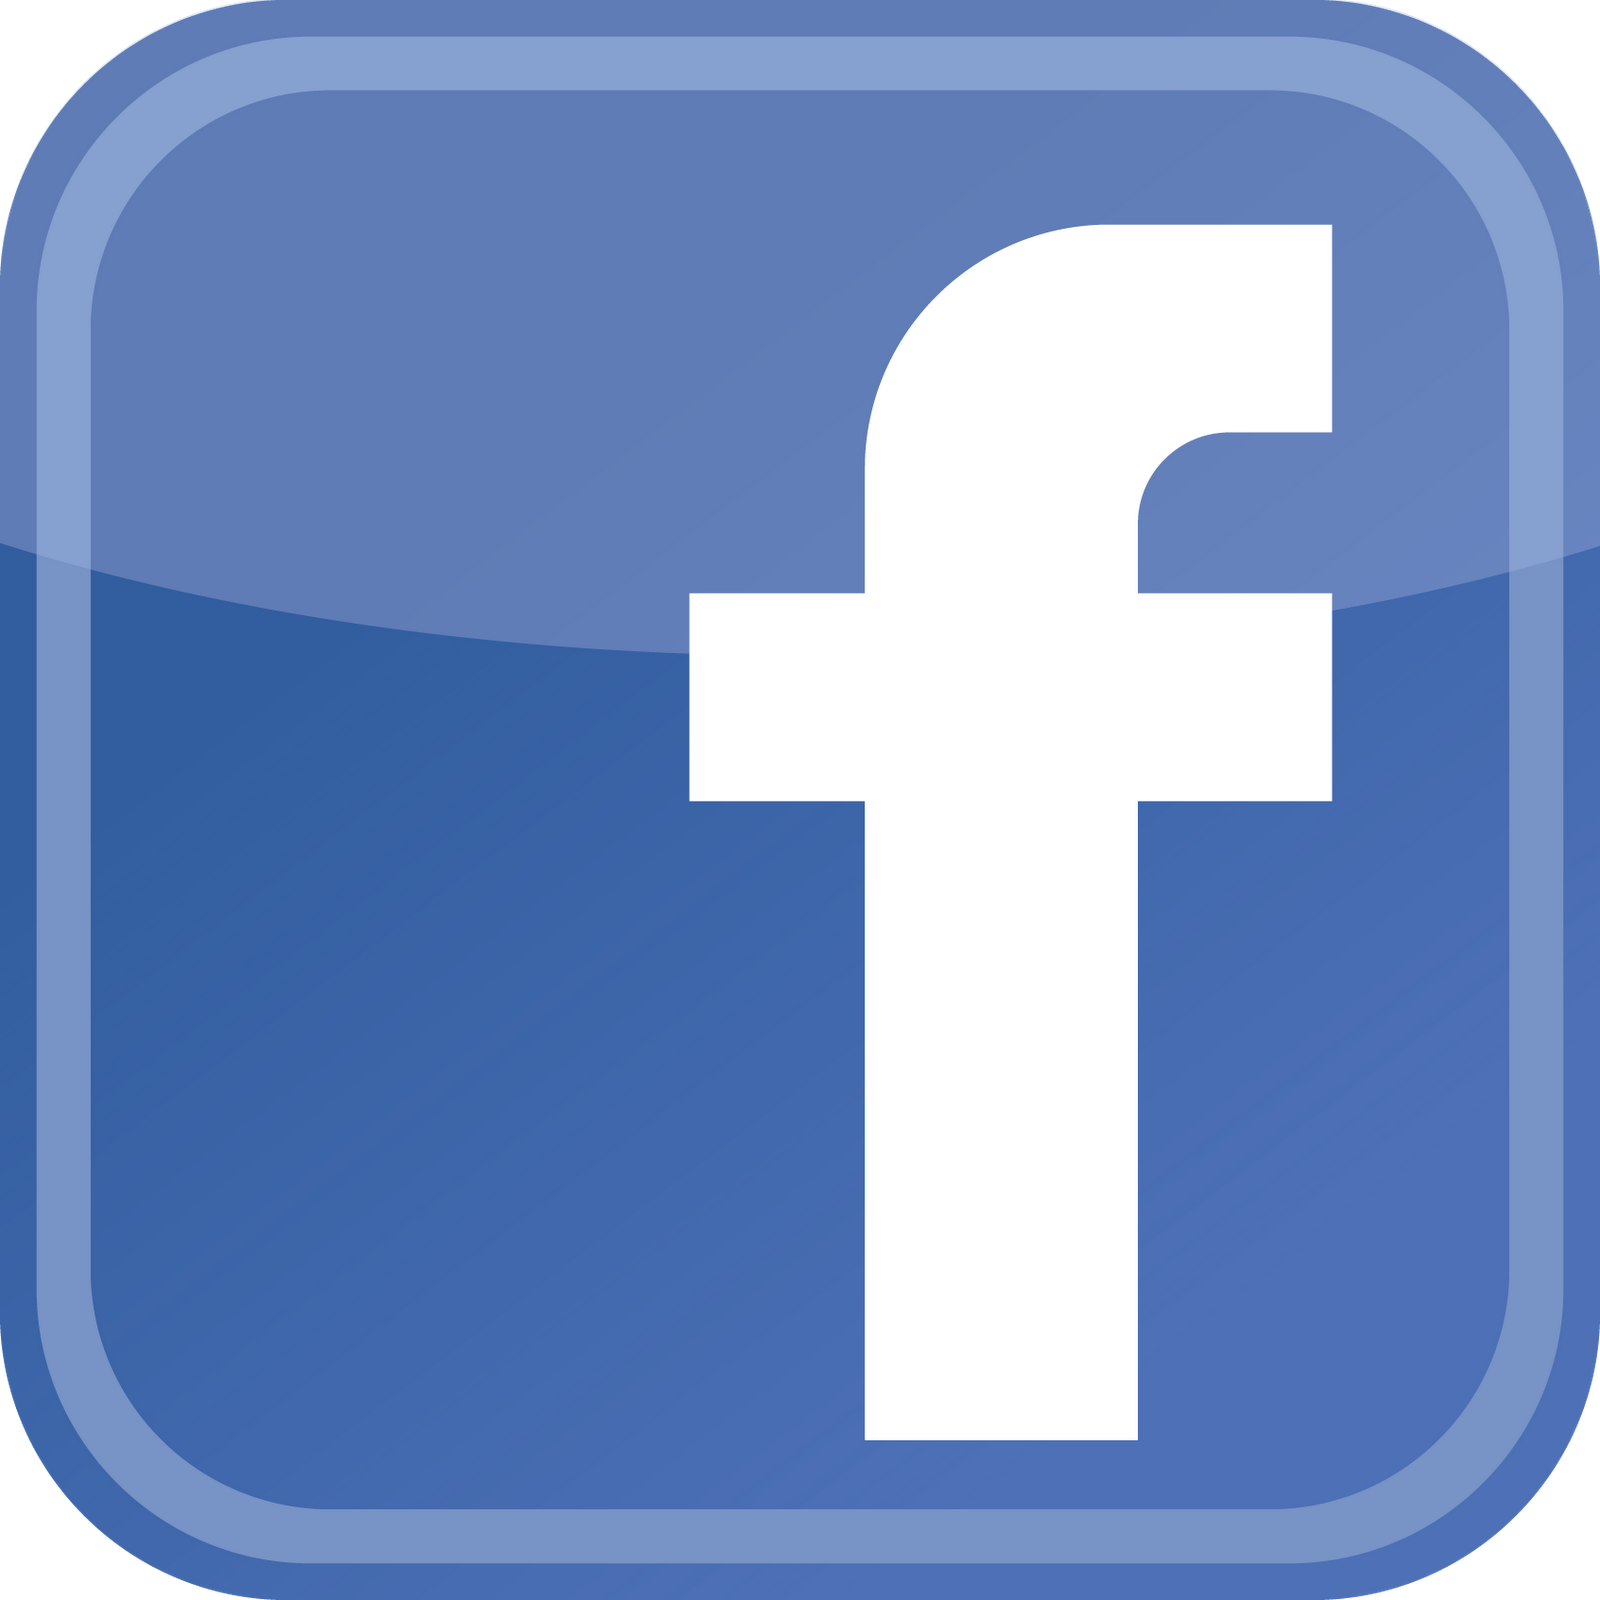 facebook_logo_2.png